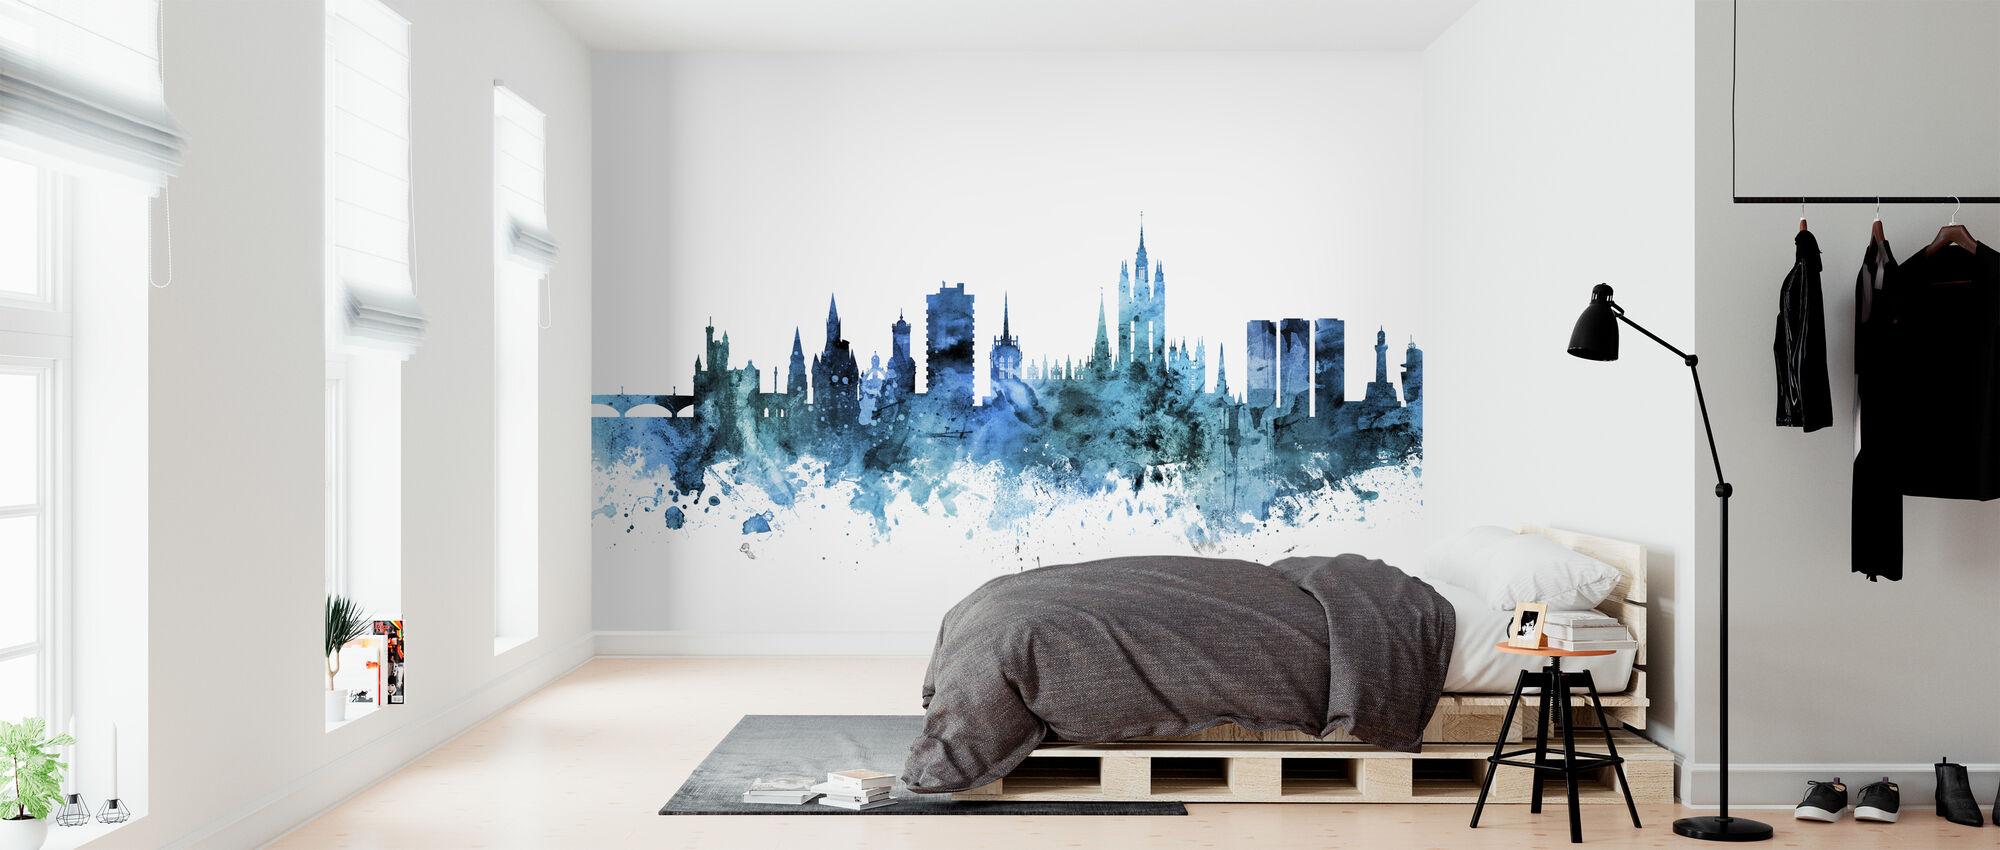 Aberdeen Scotland Skyline - Wallpaper - Bedroom